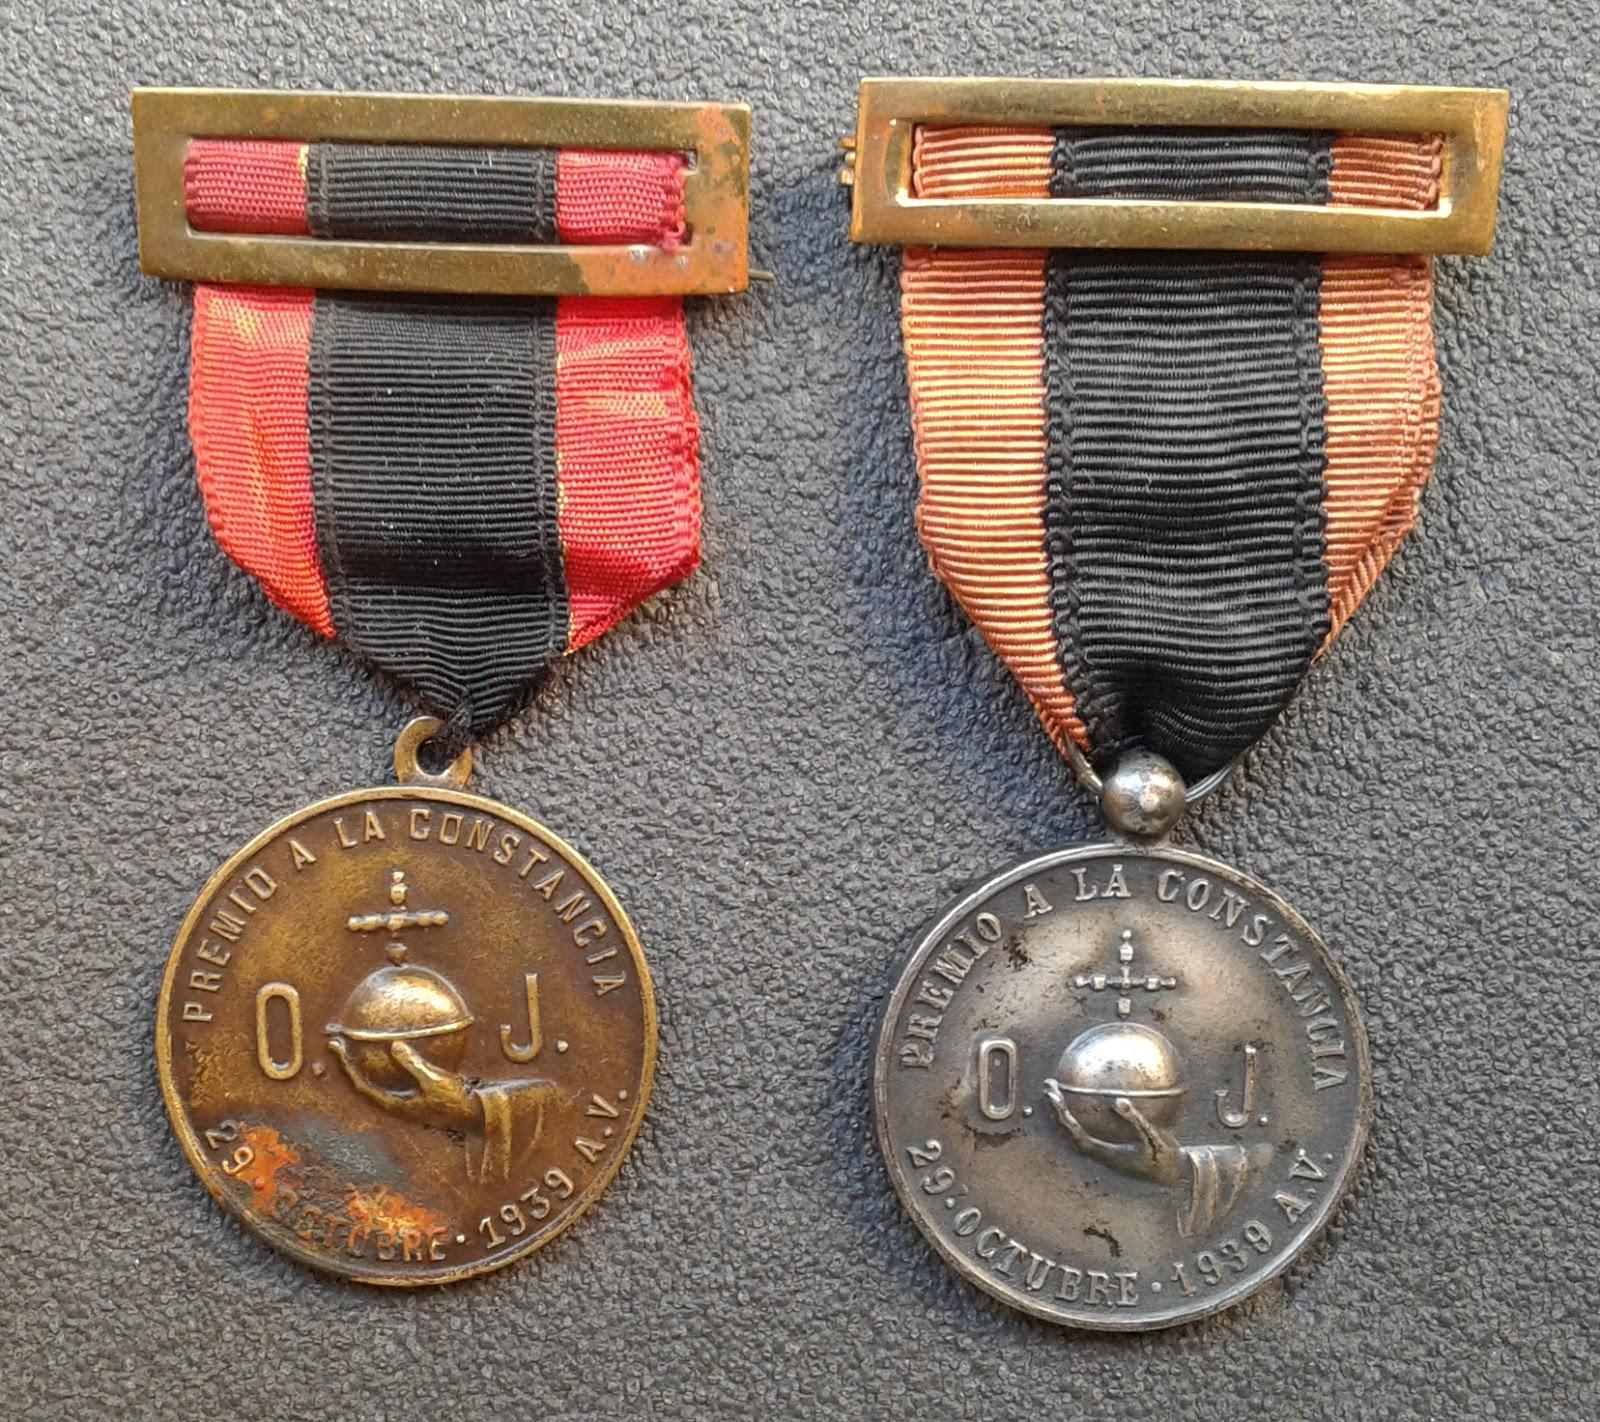 O. J. PREMIO A LA CONSTANCIA 29 DE OCTUBRE 1939 A.V. 20181001_121244